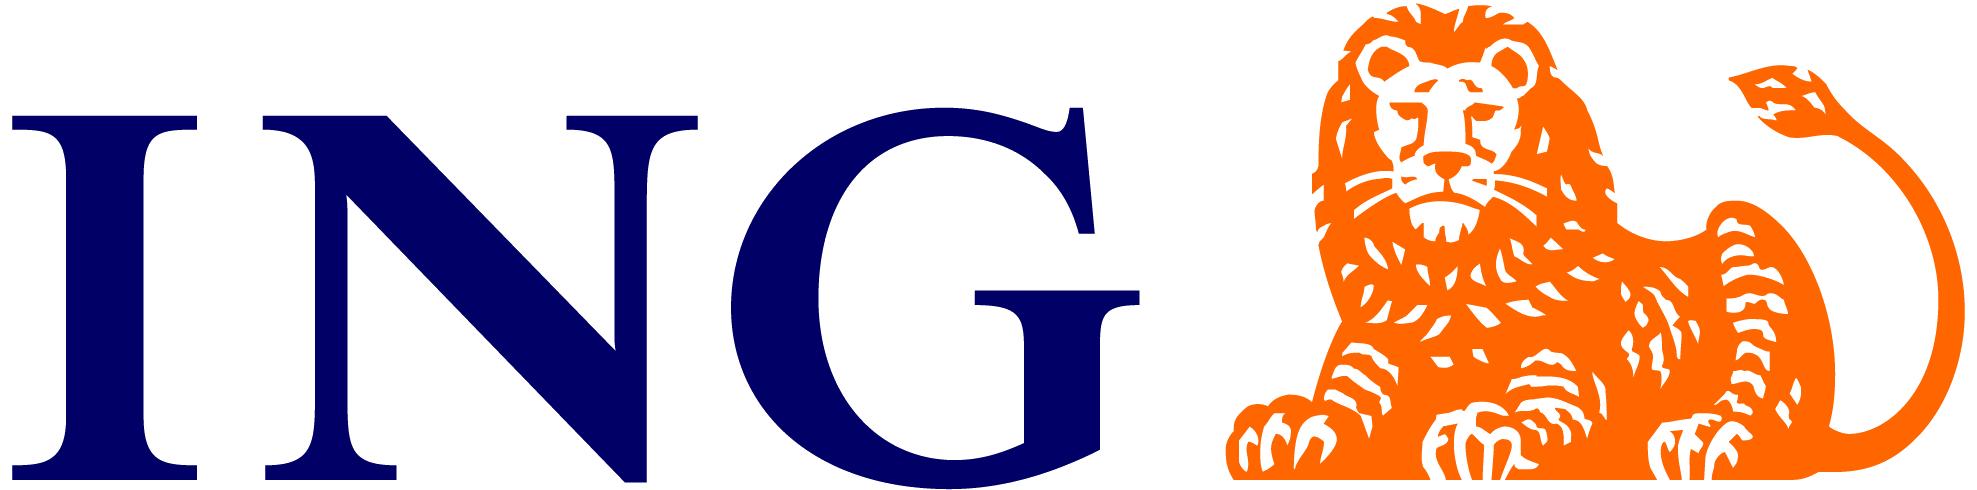 ING's Orange Everyday Bank Account – The Most Comprehensive Australian Bank Account